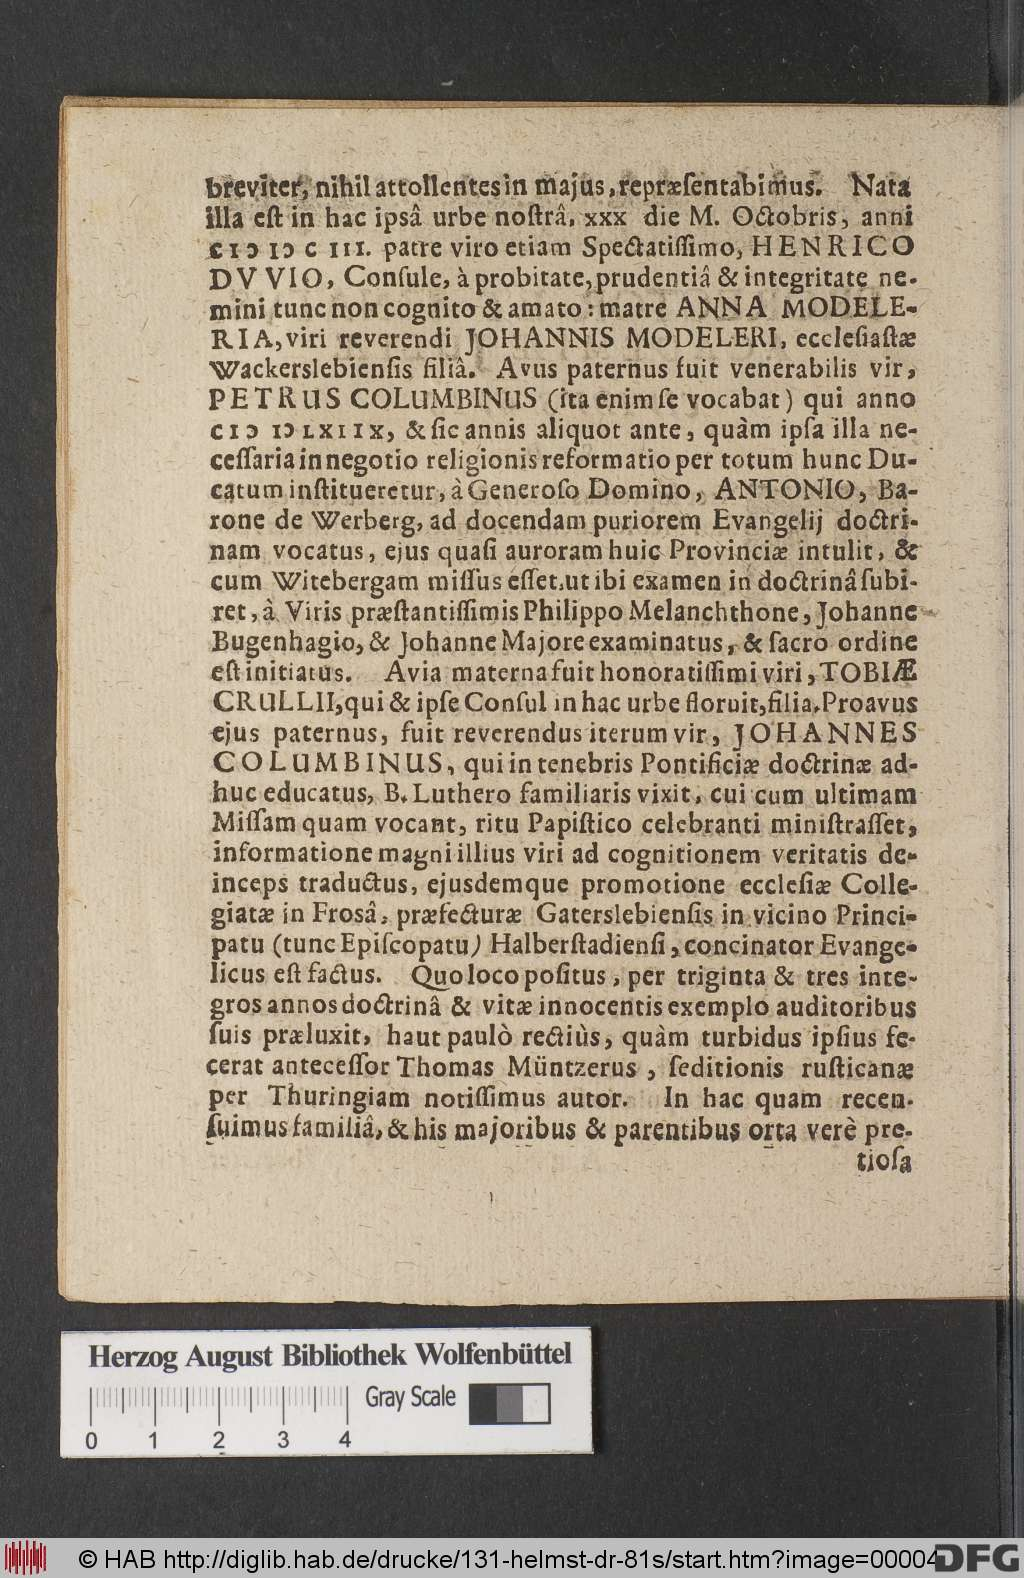 https://diglib.hab.de/drucke/131-helmst-dr-81s/00004.jpg